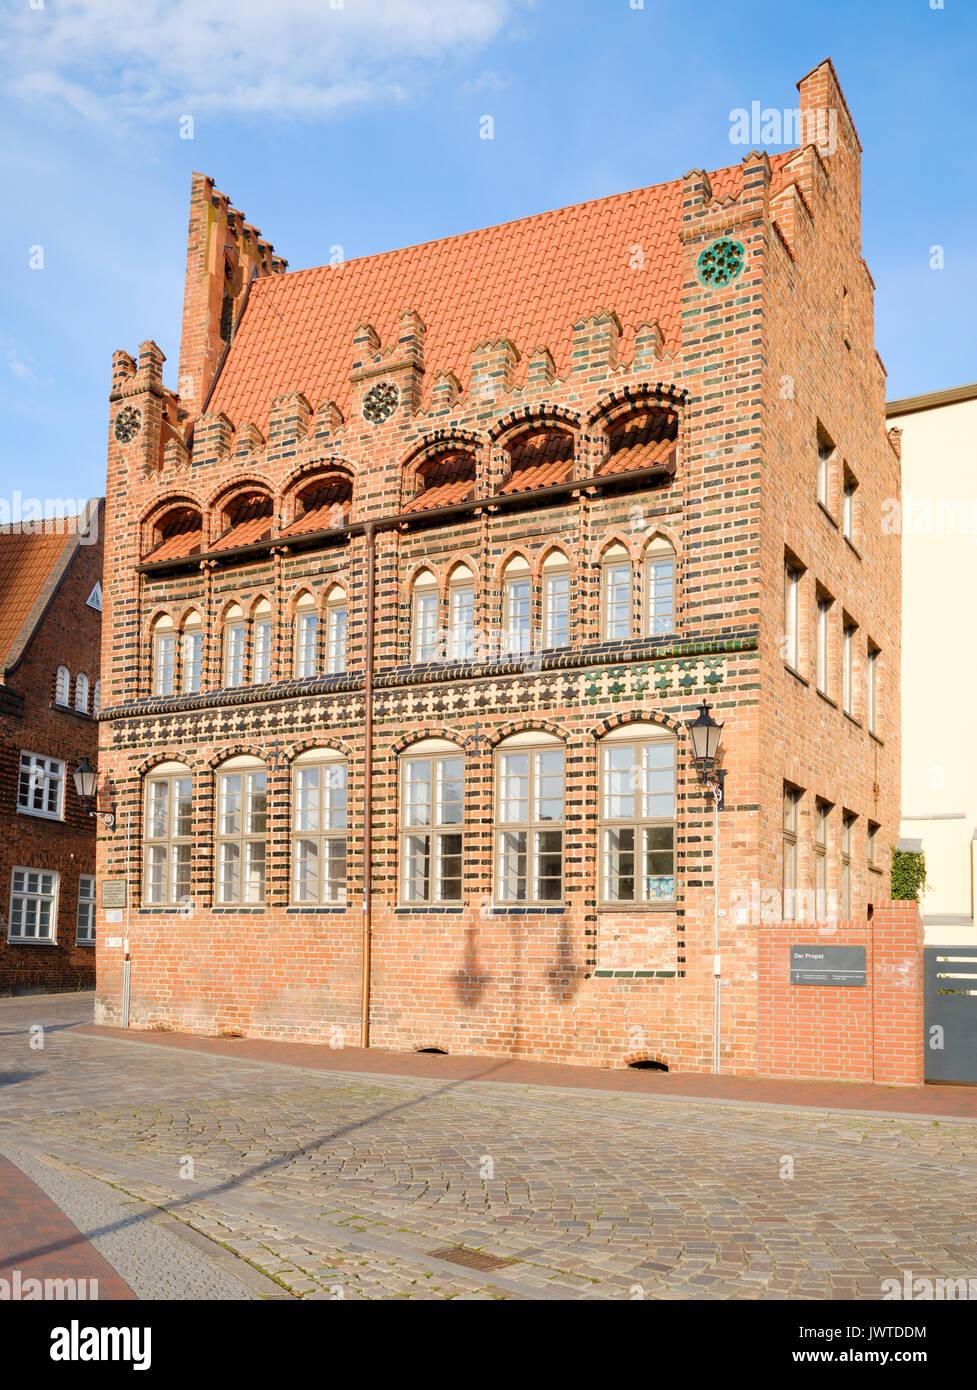 Archidiakonat, Wismar, Mecklenburg-Vorpommern, Germany - Stock Image